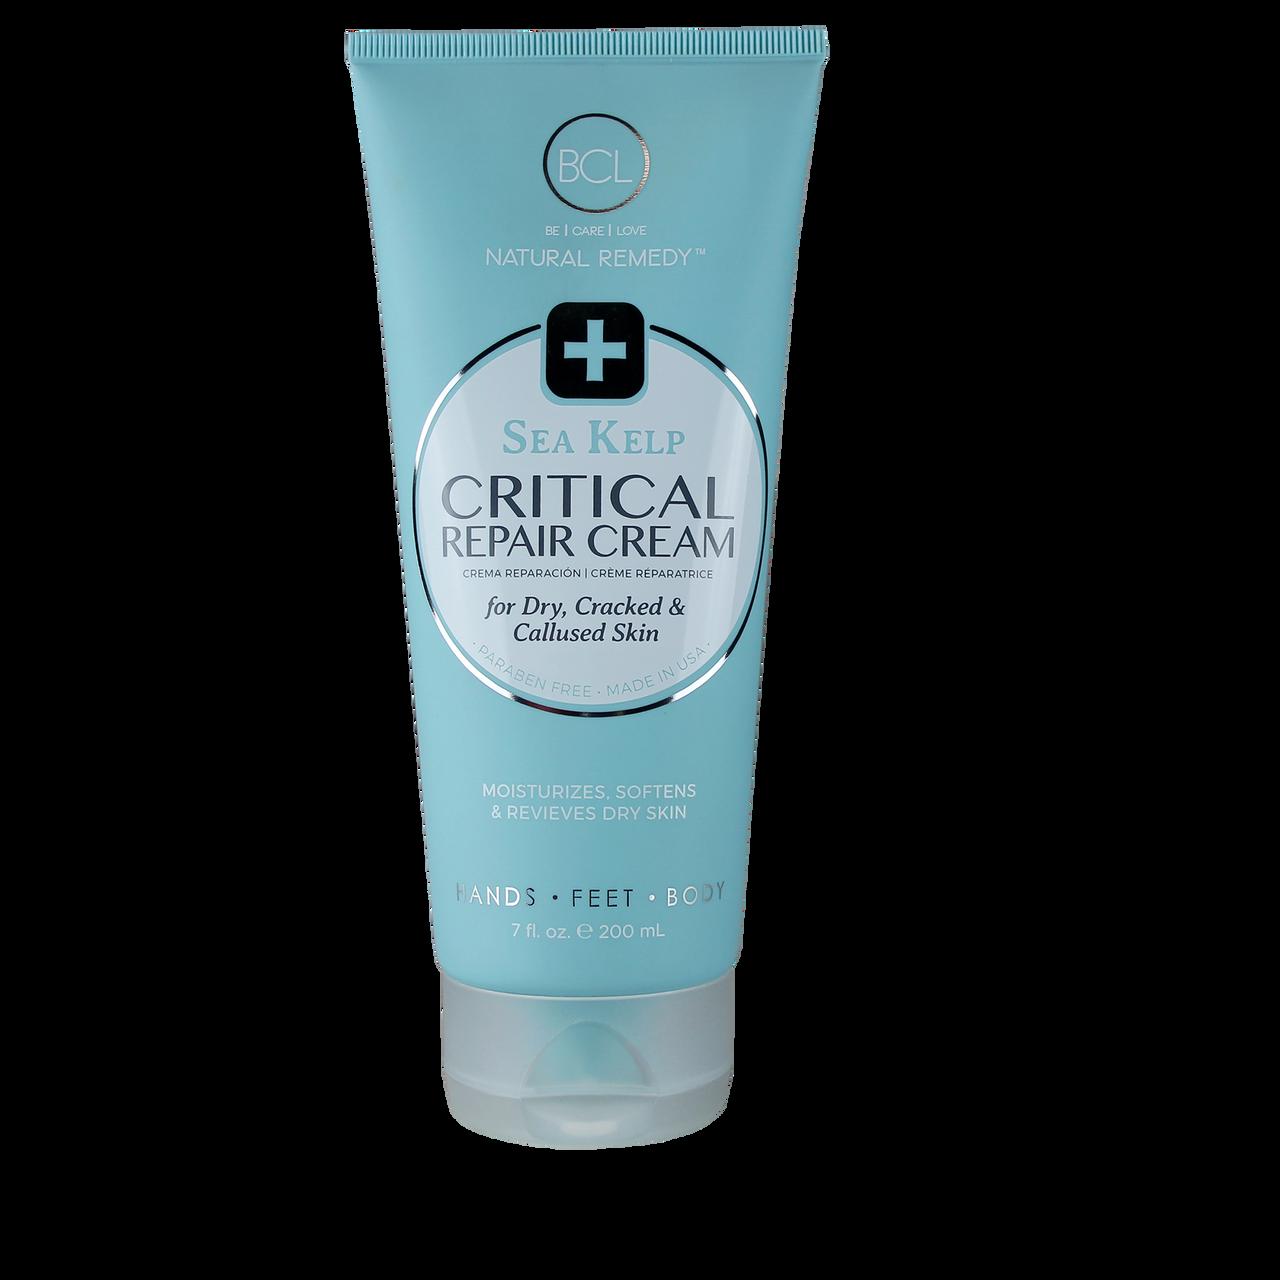 BCL Critical Repair Cream - Original Sea Kelp (7 oz)